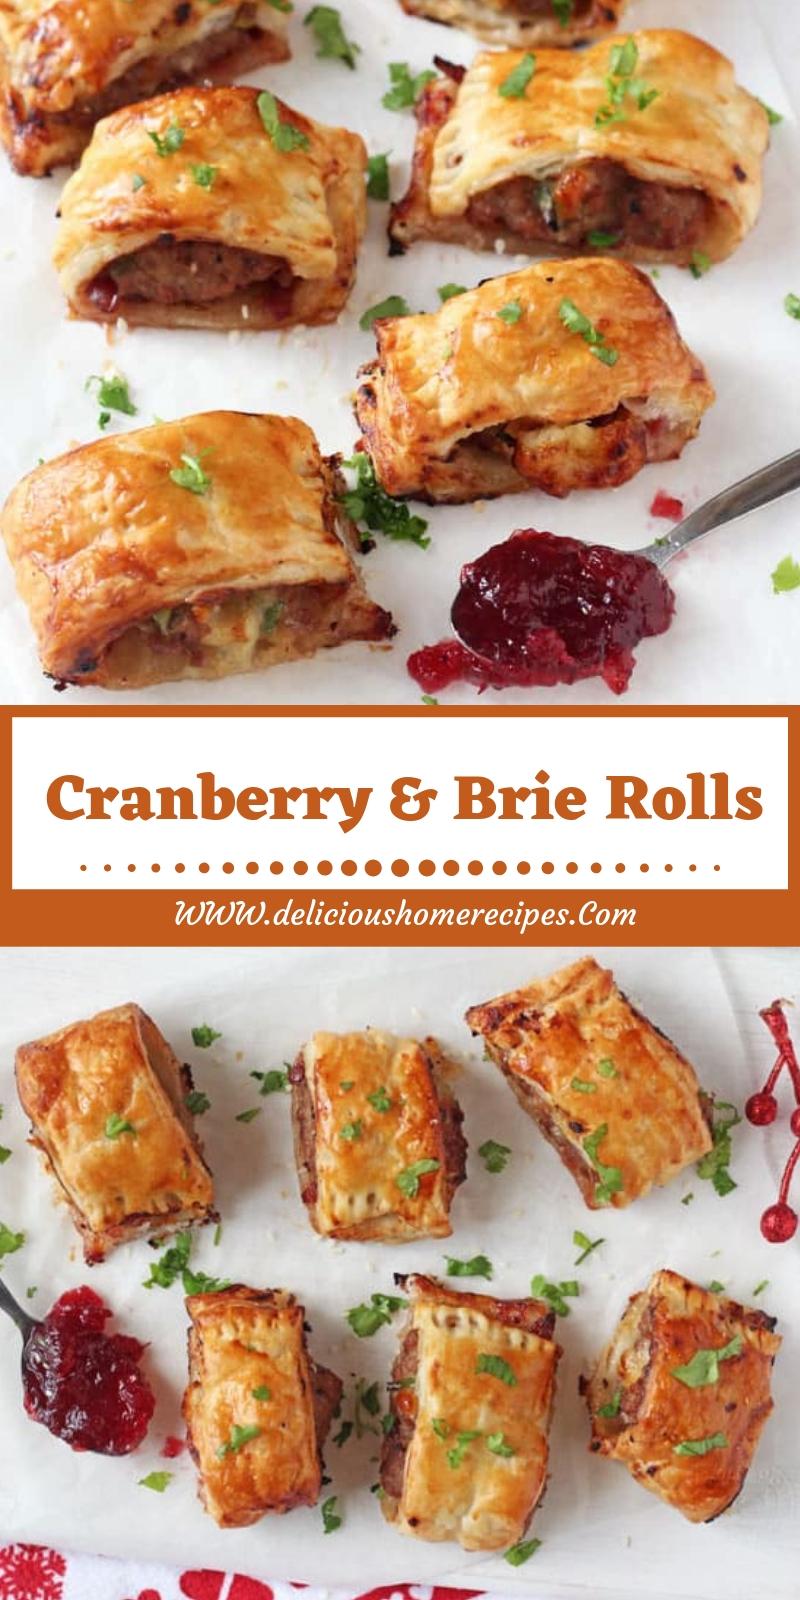 Cranberry & Brie Rolls